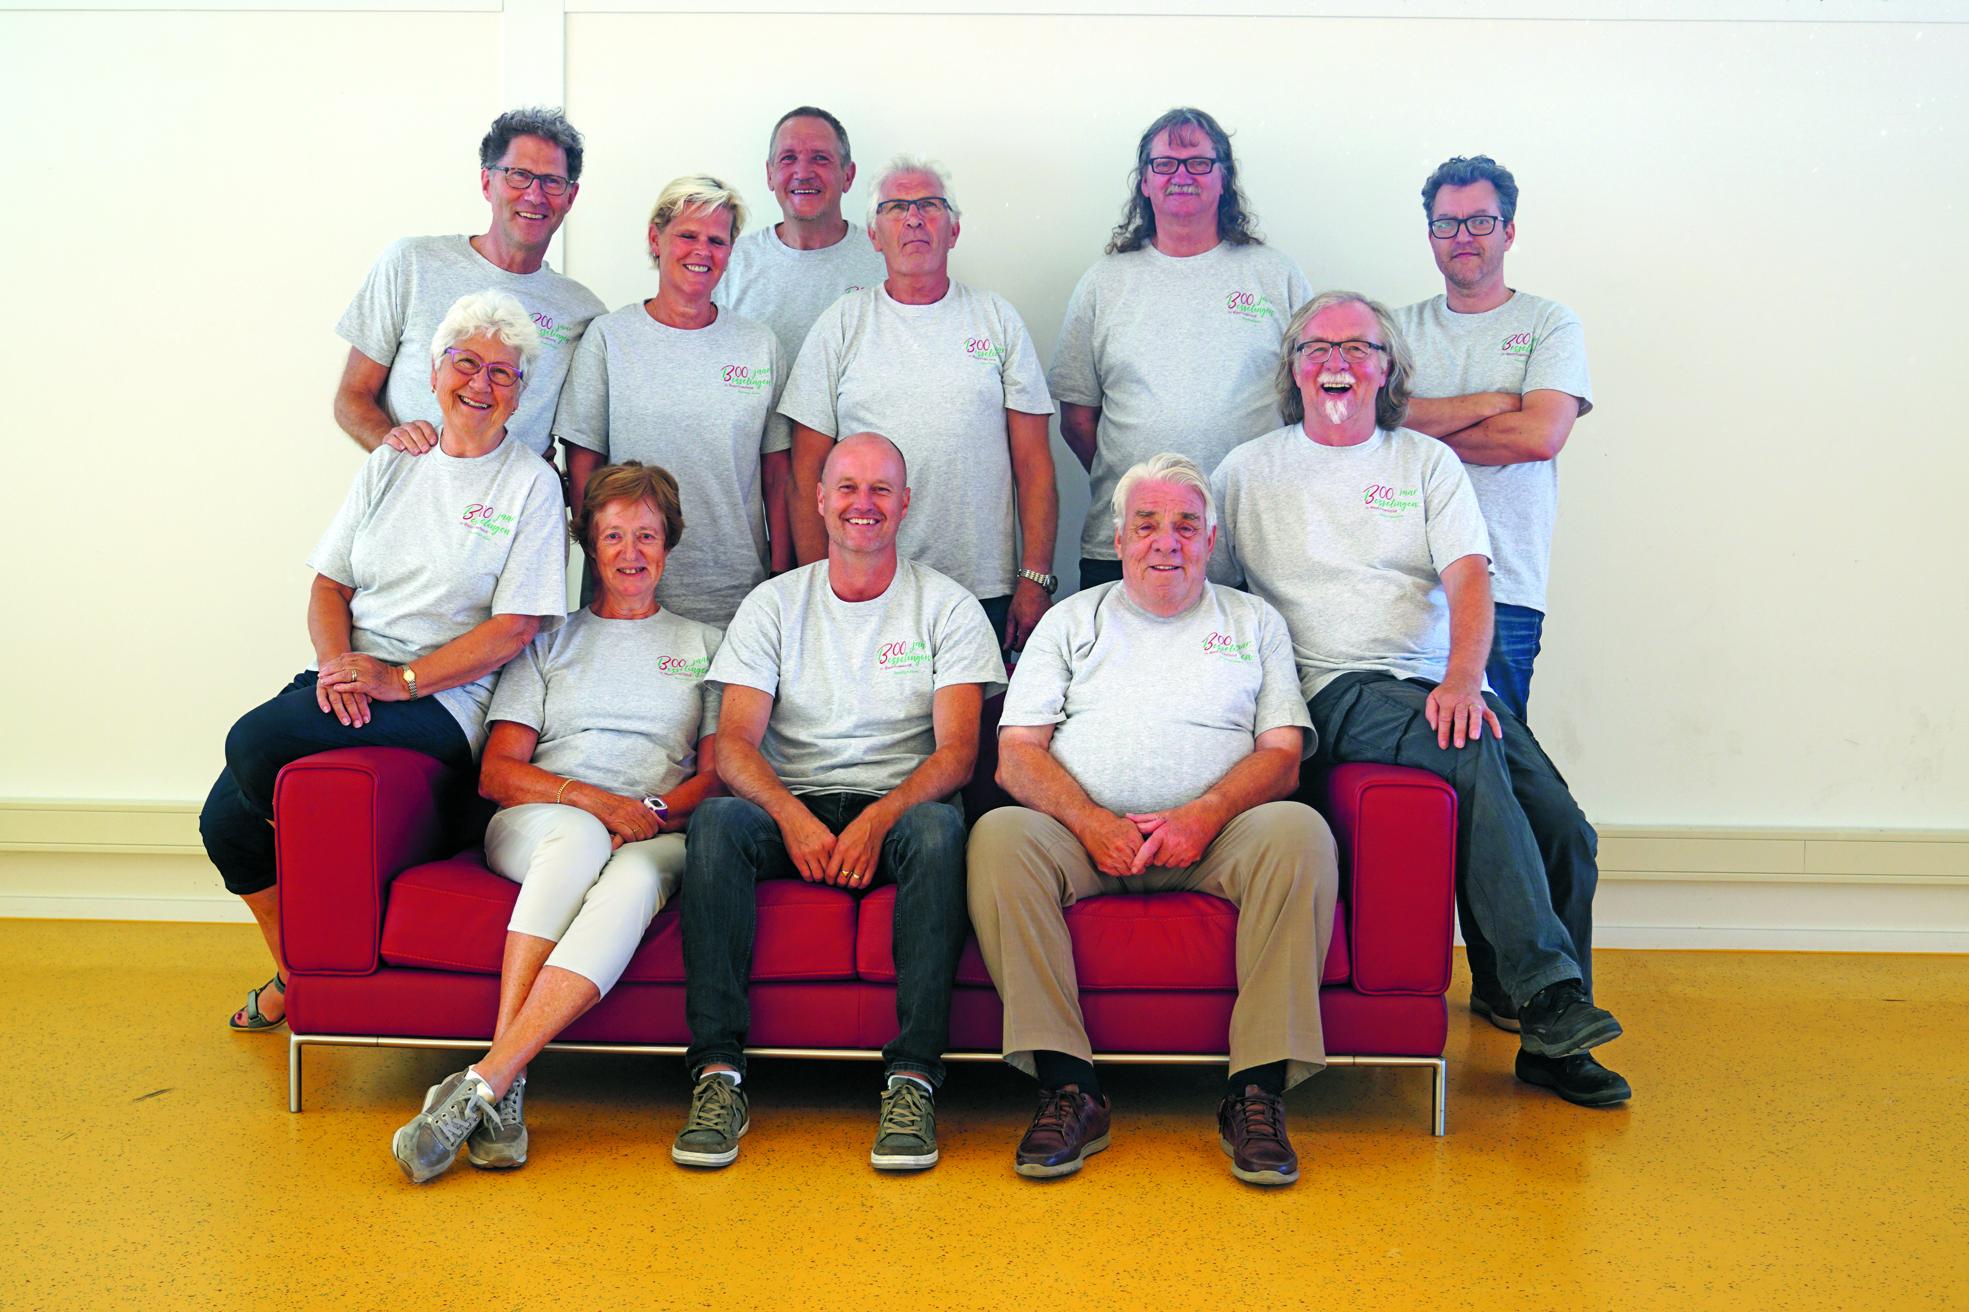 Werkgroep 300 jaar Besseling met v. l.n.r. Martha Besseling, Marie Besseling, Afie Besseling, Geertje van der Gulik, Simon Besseling en Theo Besseling, familie van initiator Piet Besseling. (Foto: Besseling)